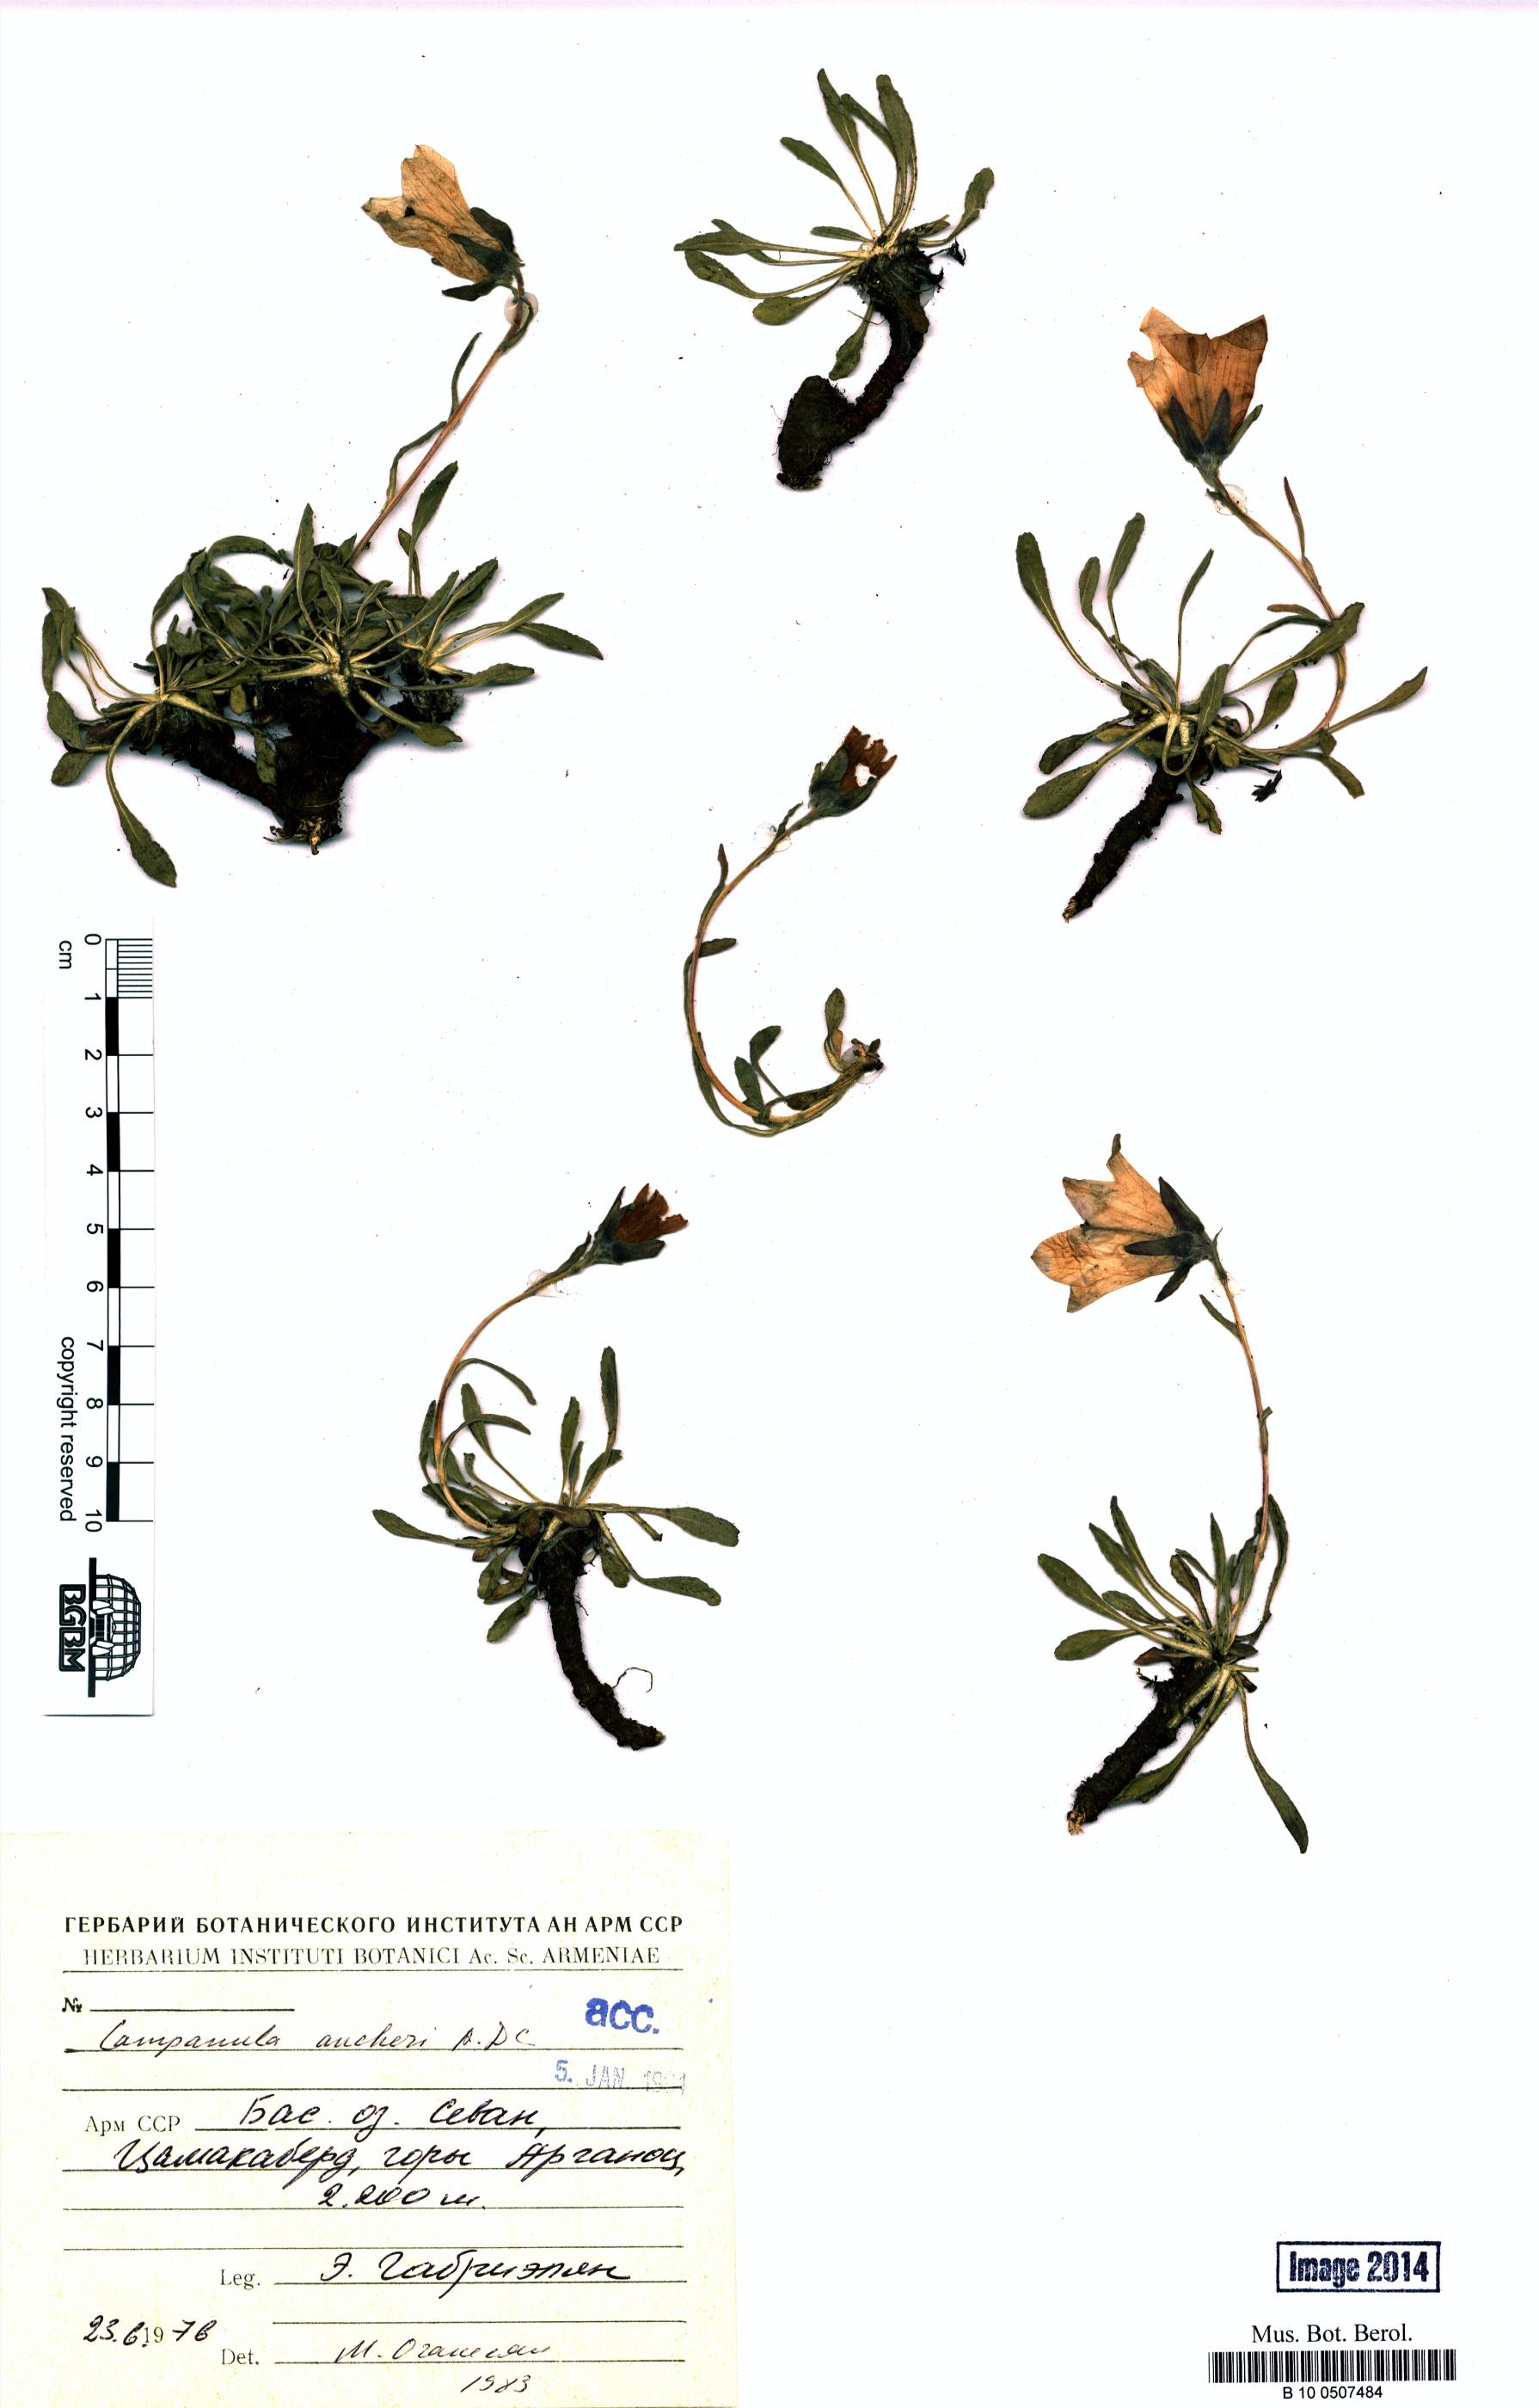 http://ww2.bgbm.org/herbarium/images/B/10/05/07/48/B_10_0507484.jpg